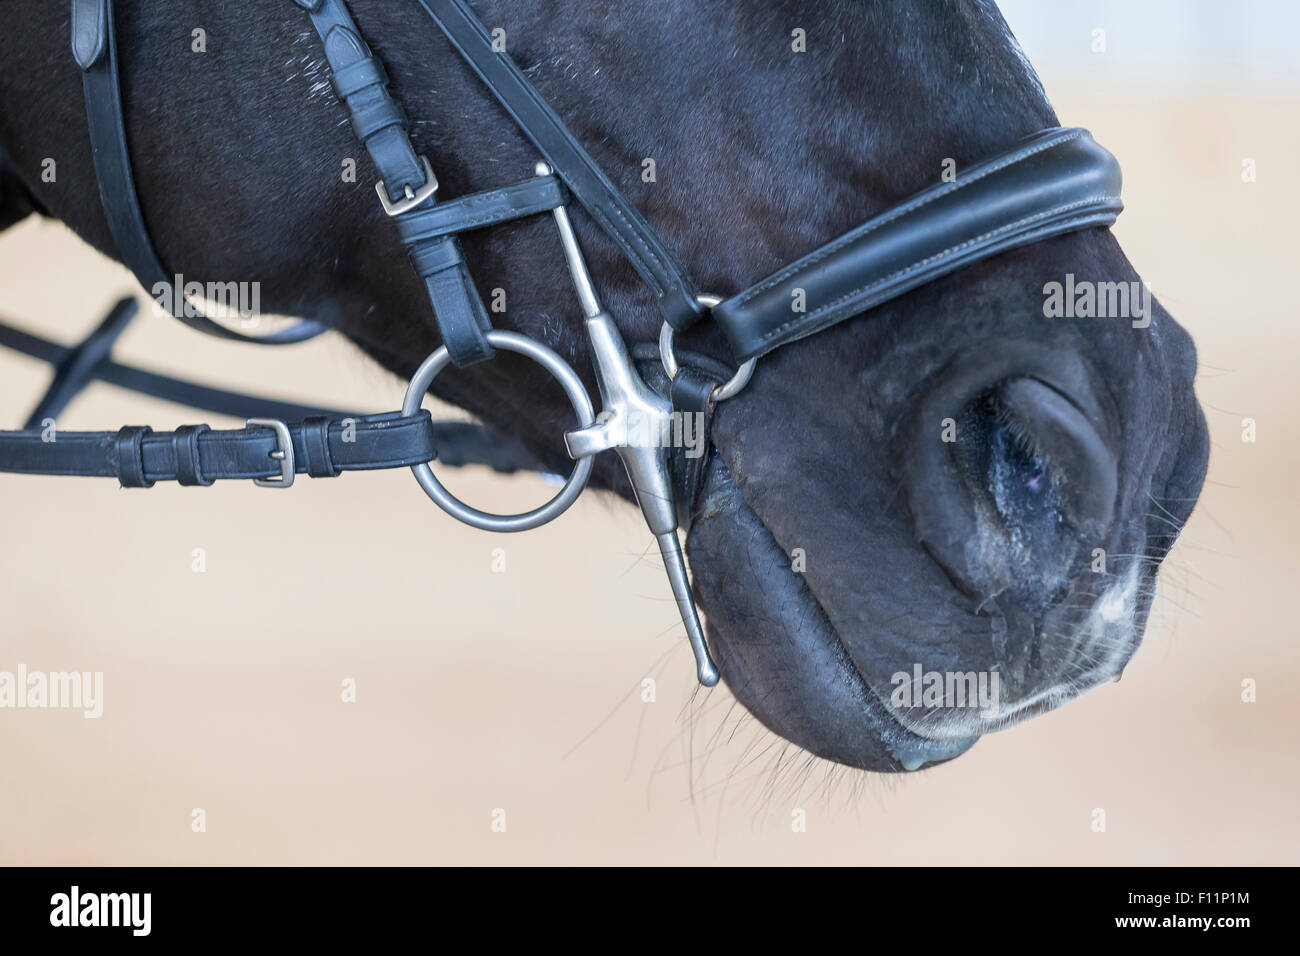 Caballo negro adulto snaffle Warmblood mejillas Imagen De Stock